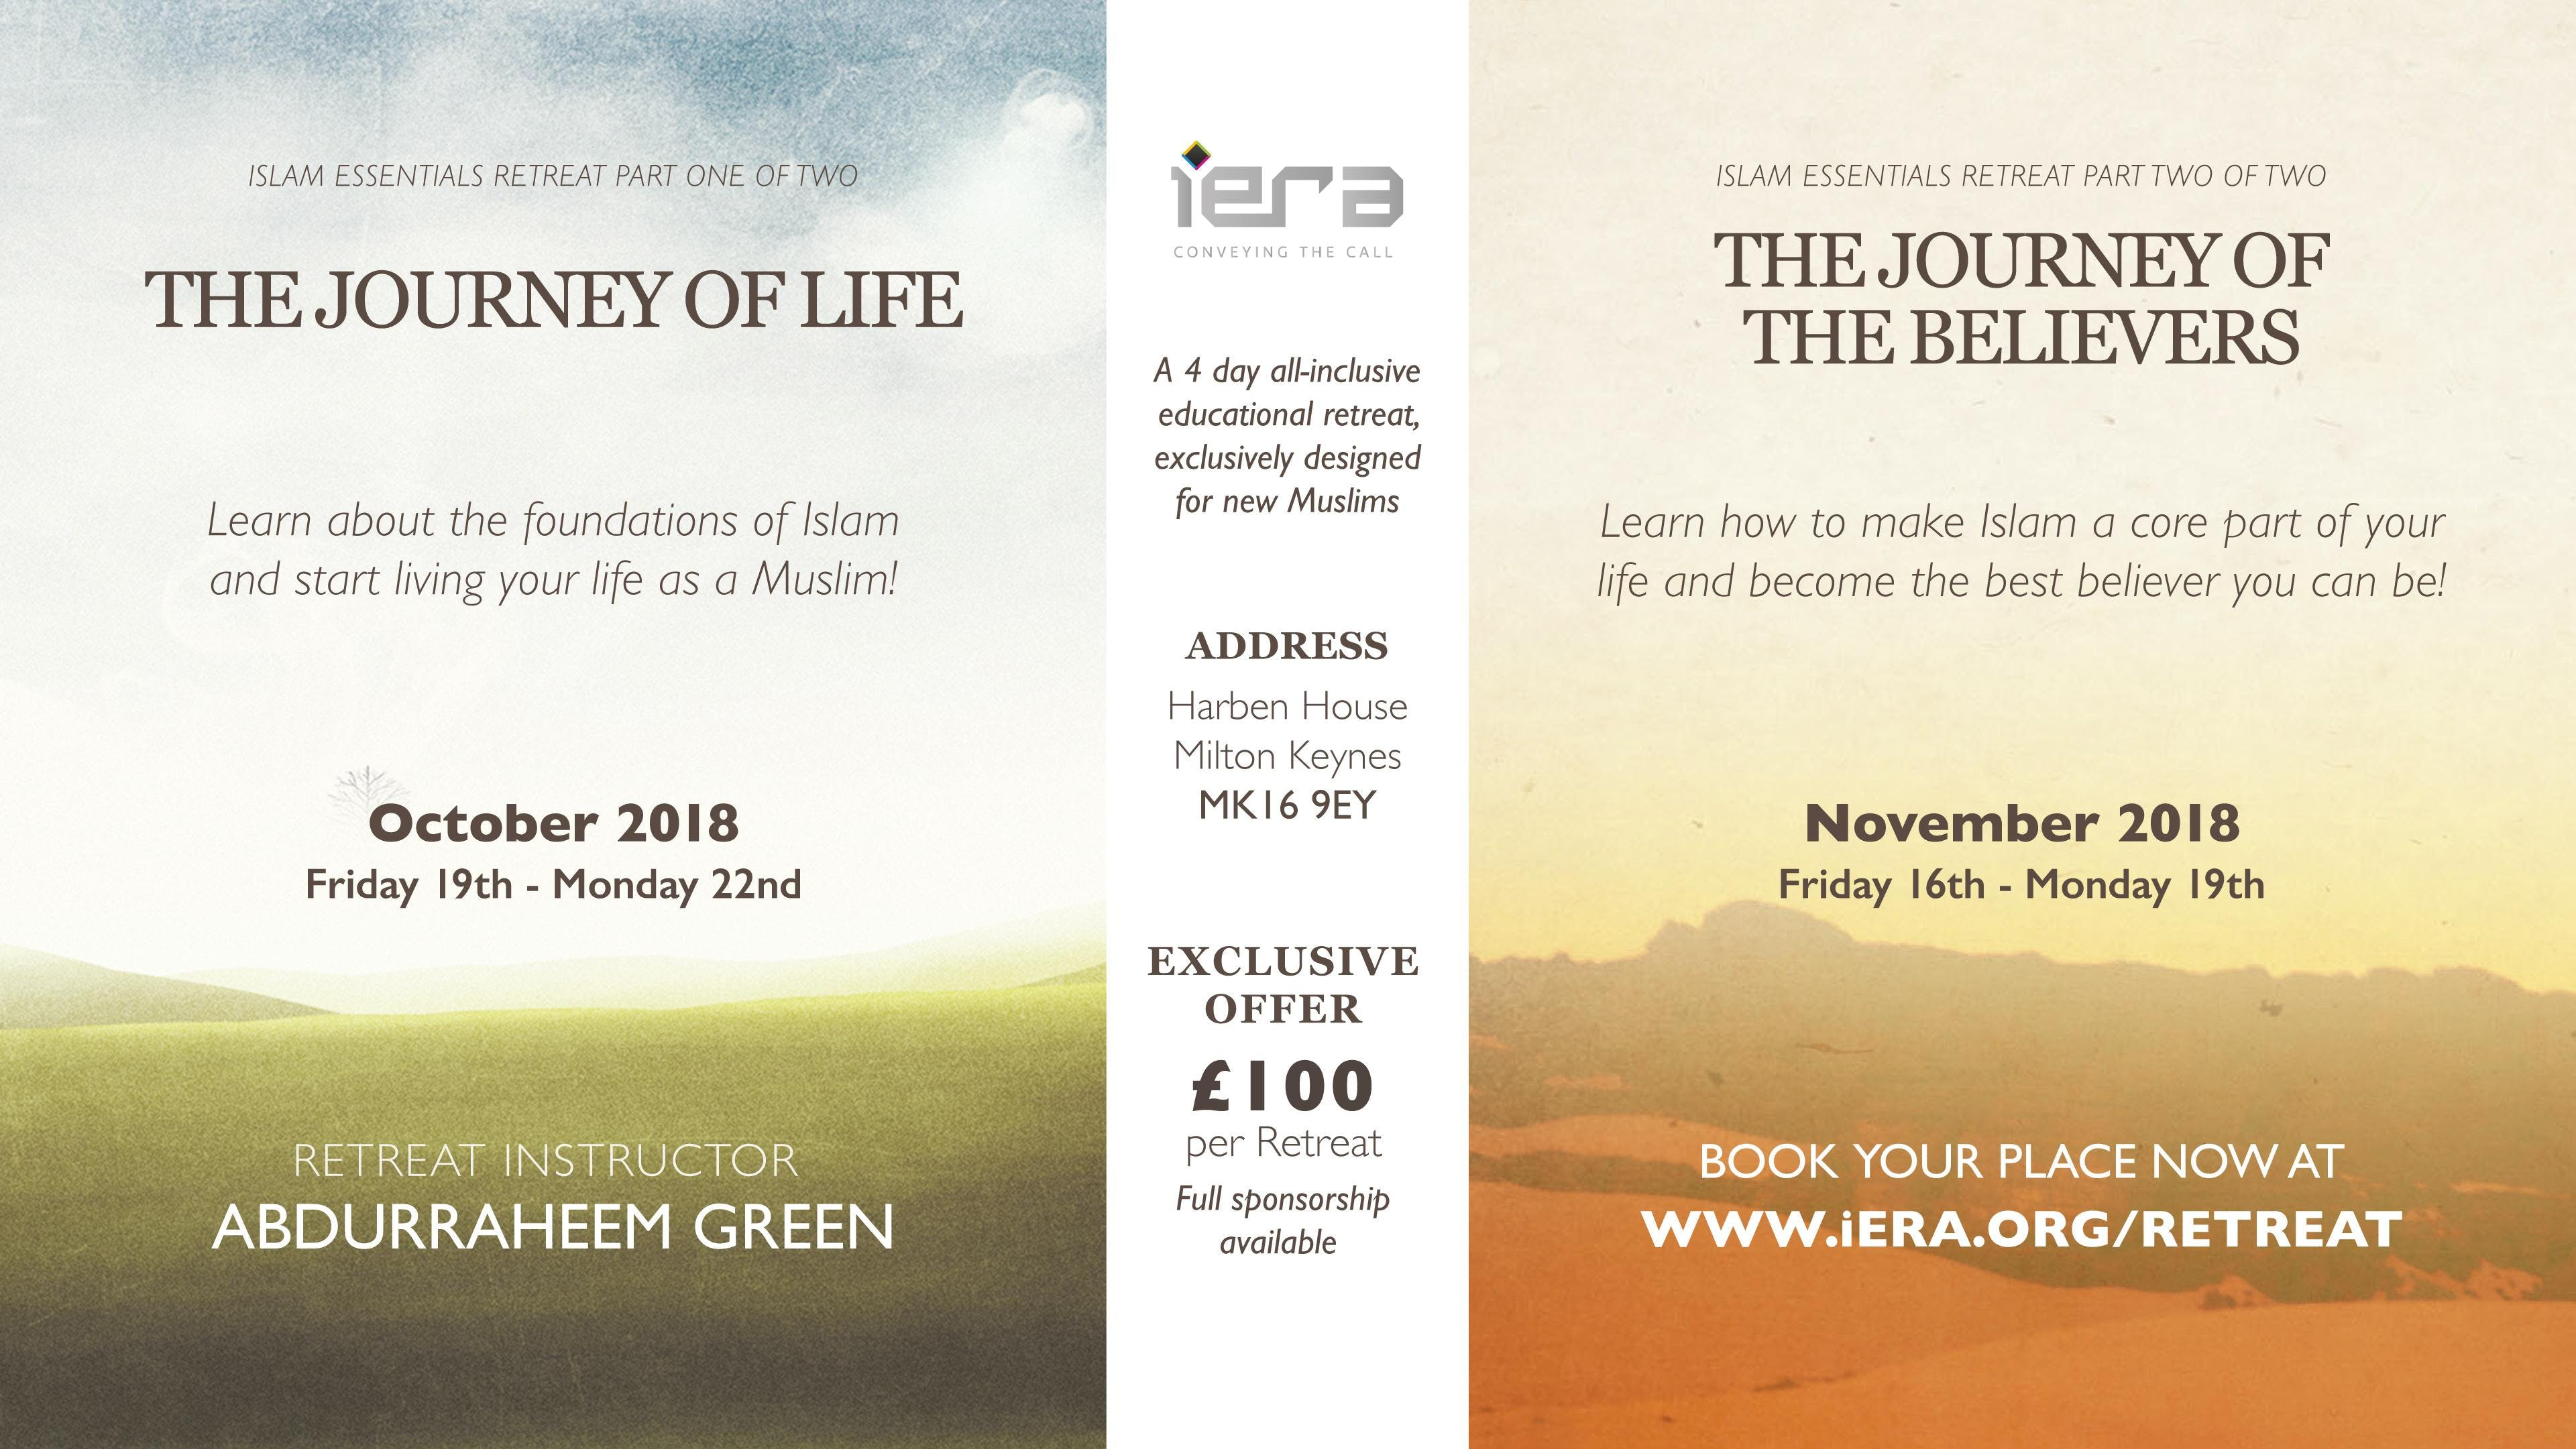 The Journey Of Life - Islam Essentials Retrea